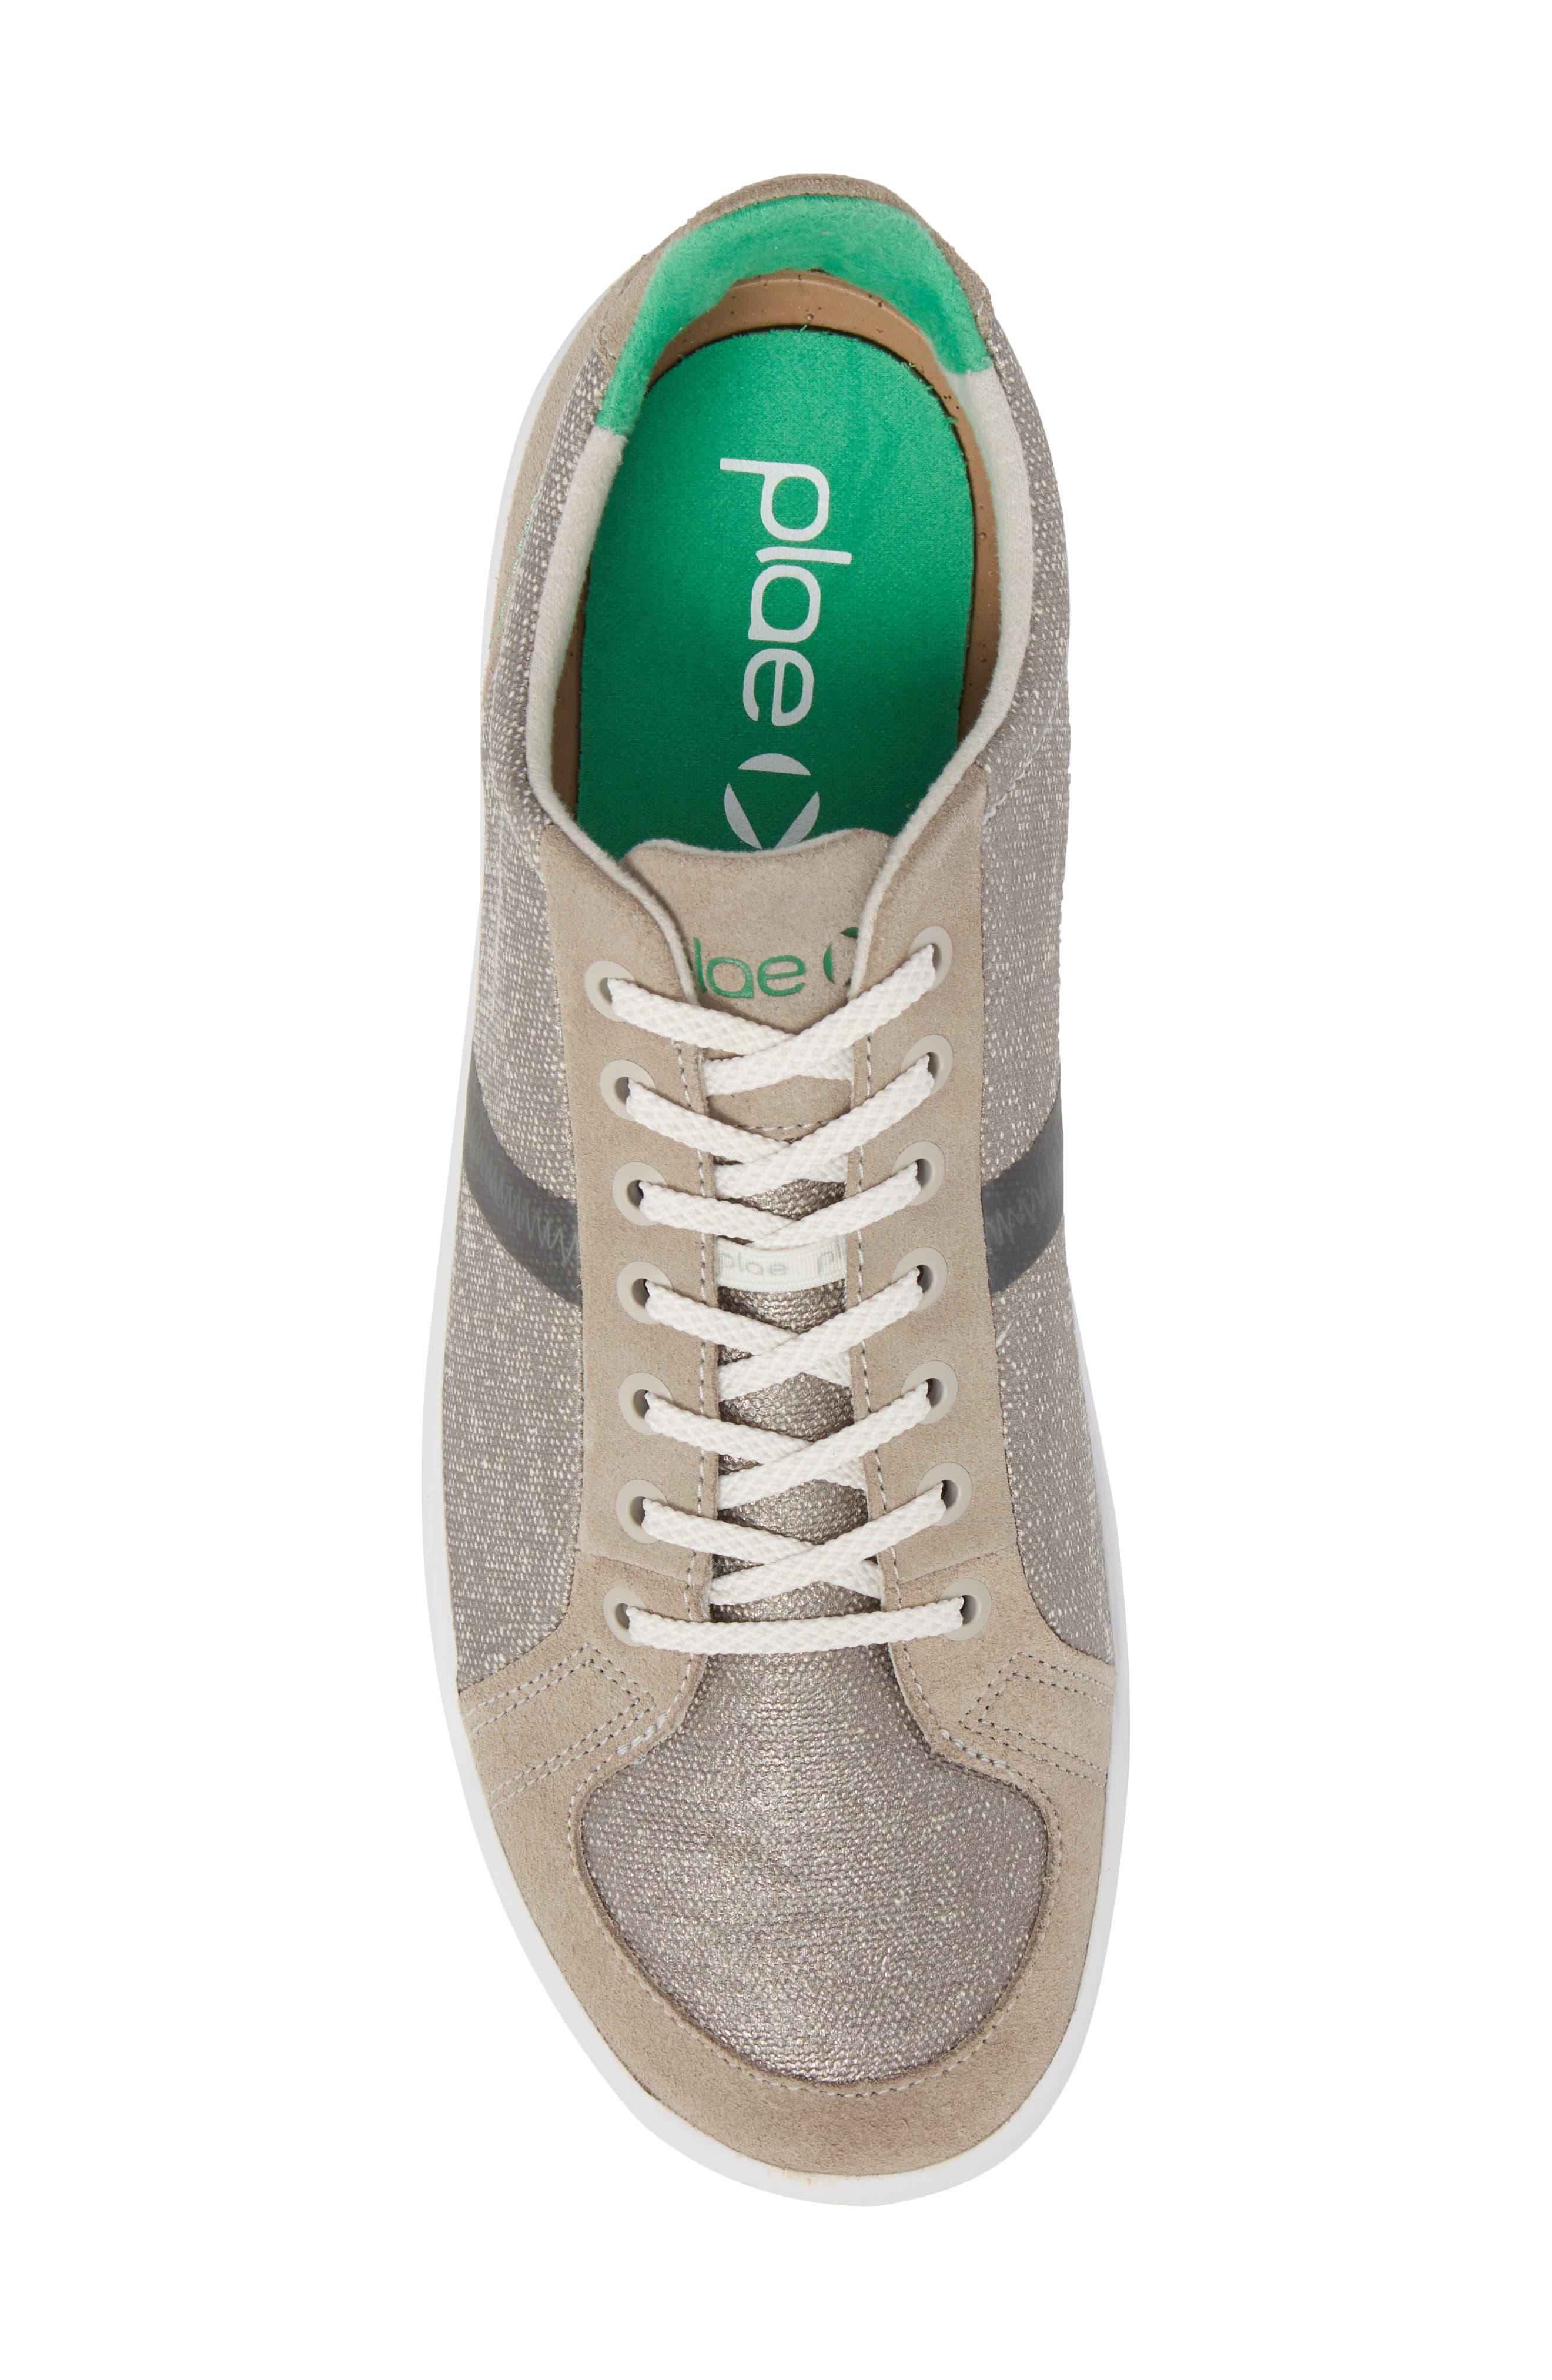 Prospect Low Top Sneaker,                             Alternate thumbnail 5, color,                             Stone